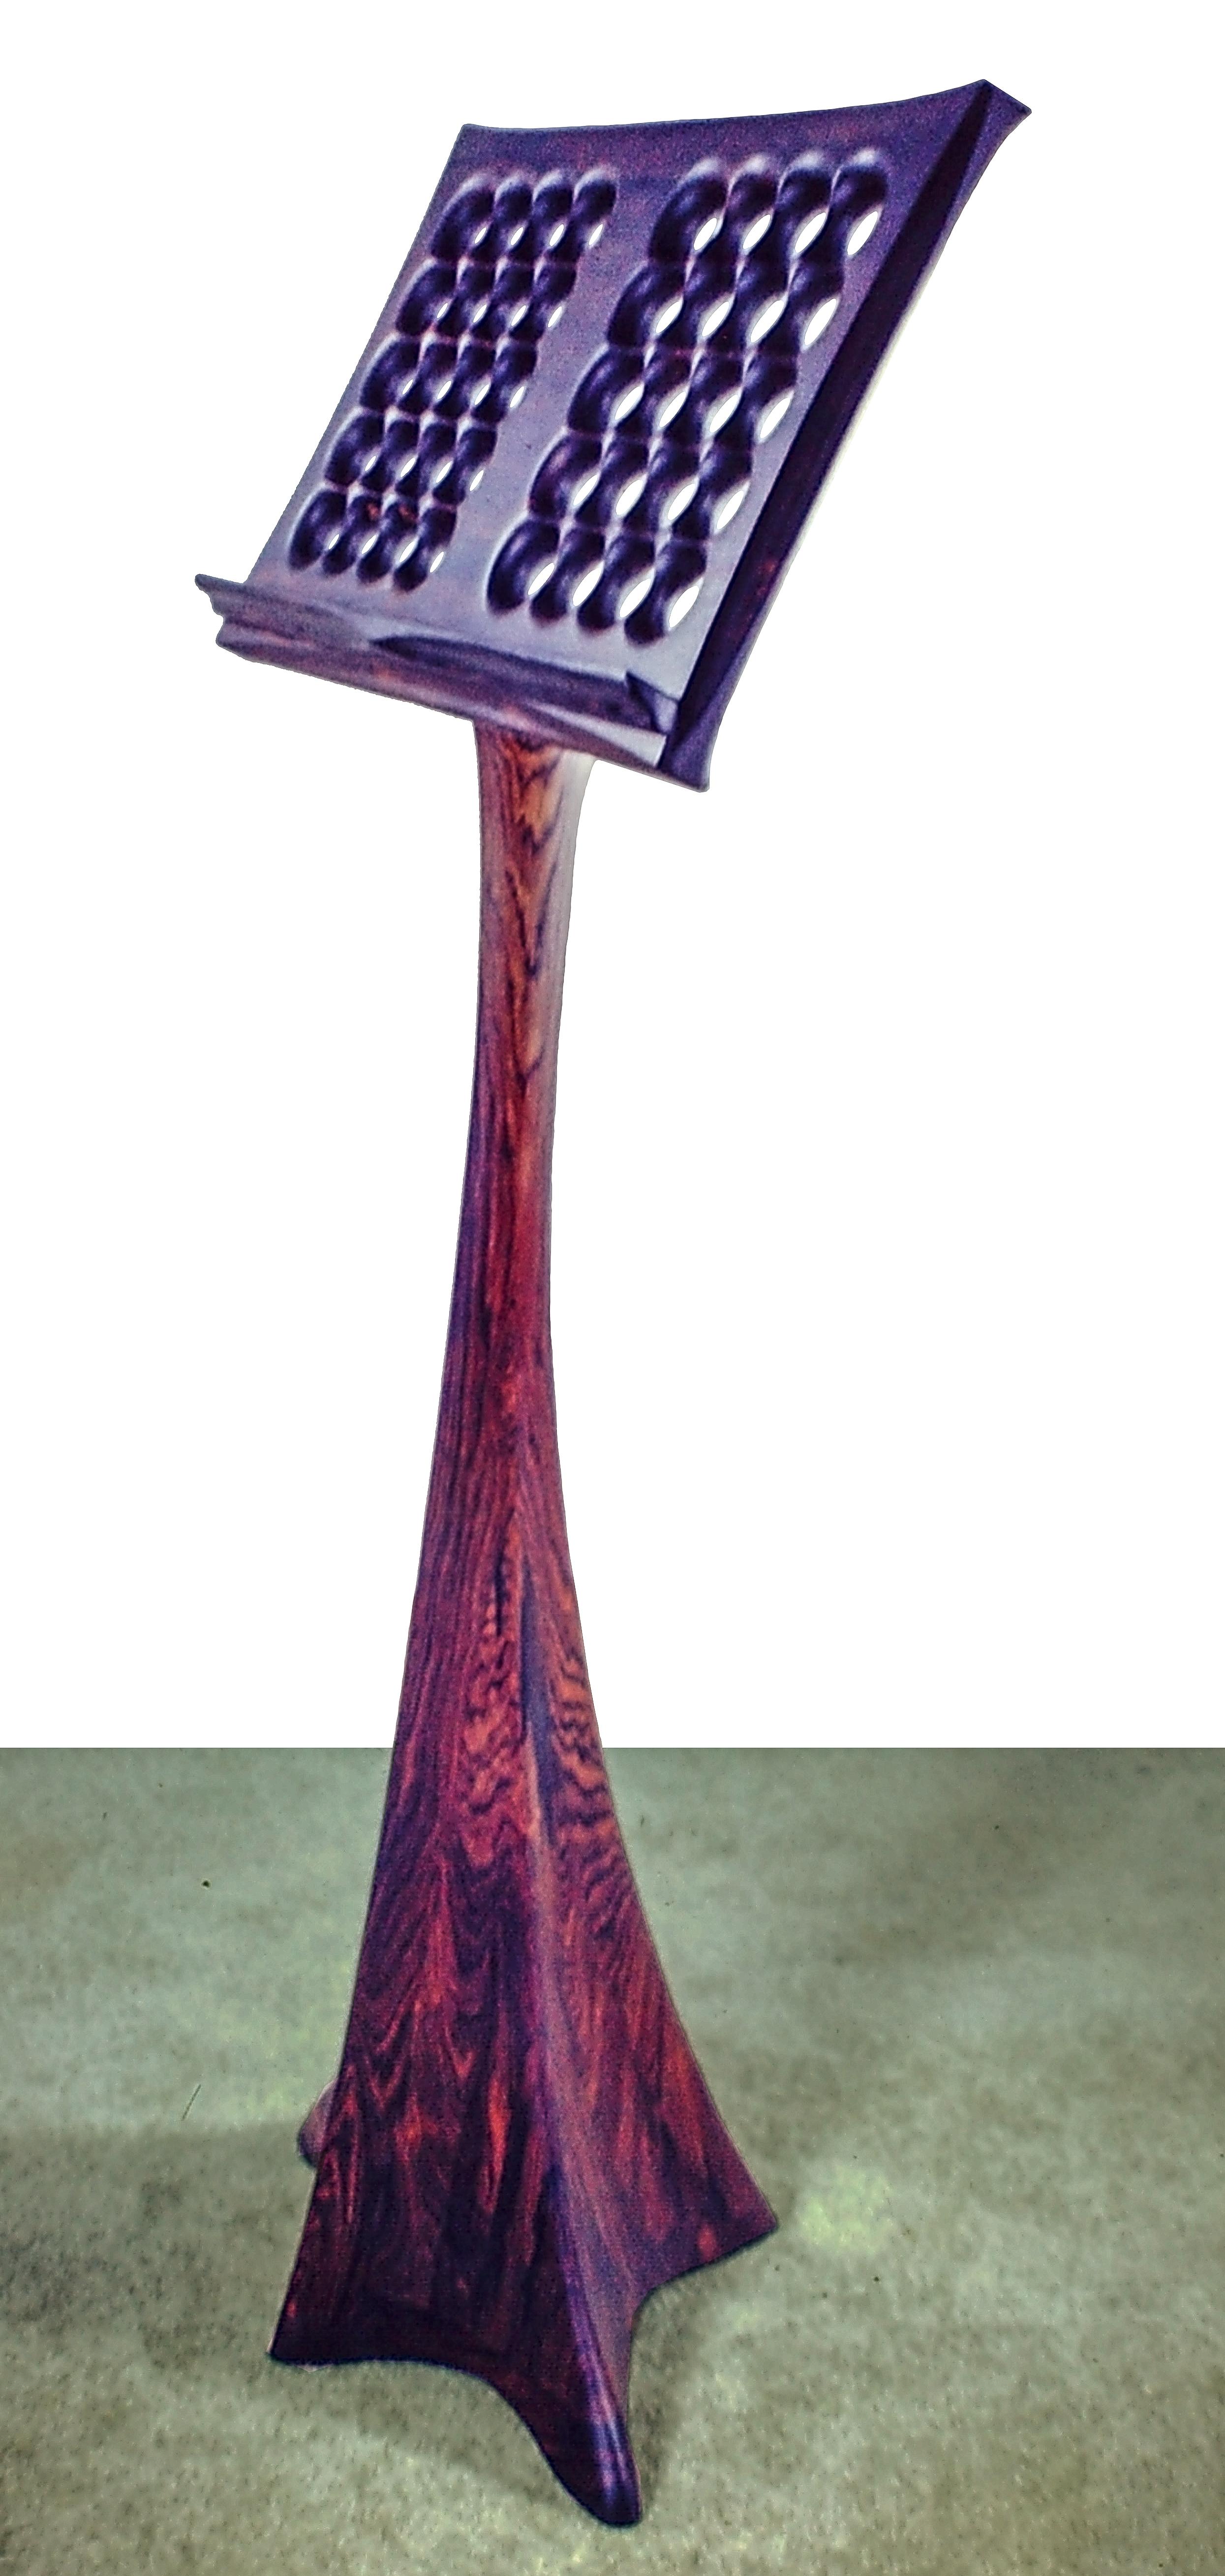 music-stand-vertical-grain